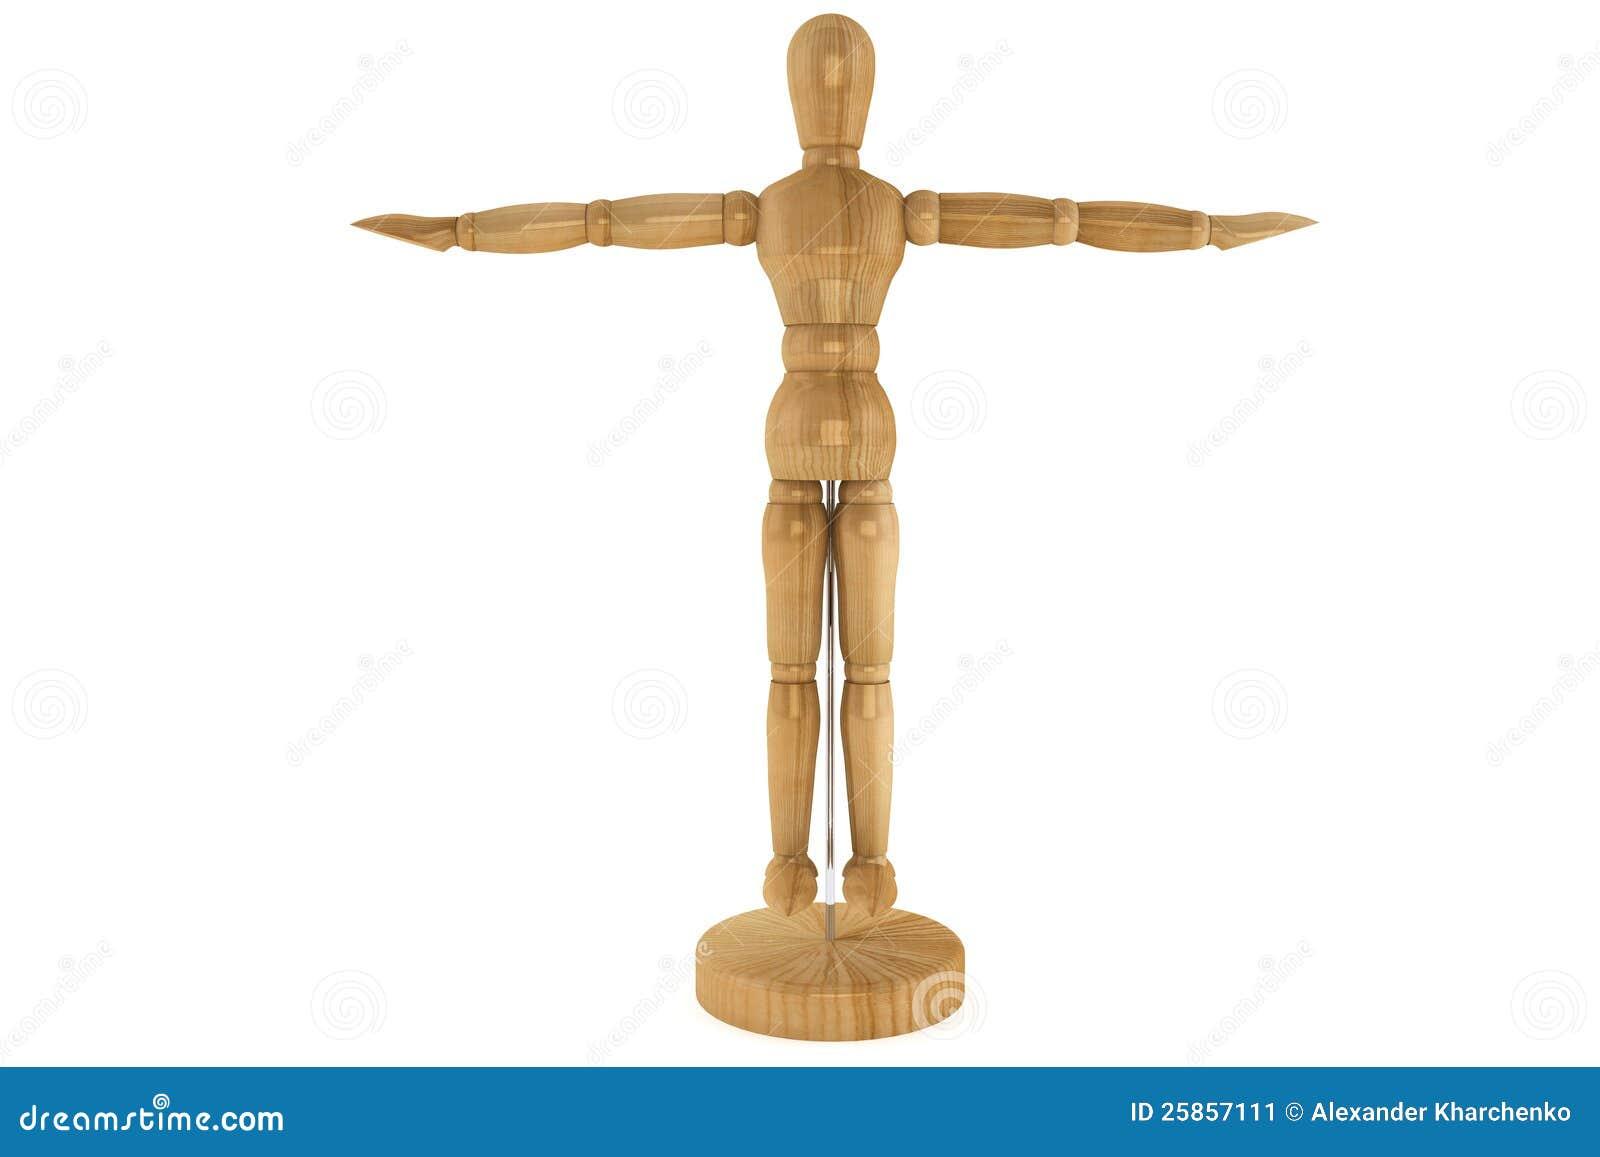 Wooden artists Mannequin